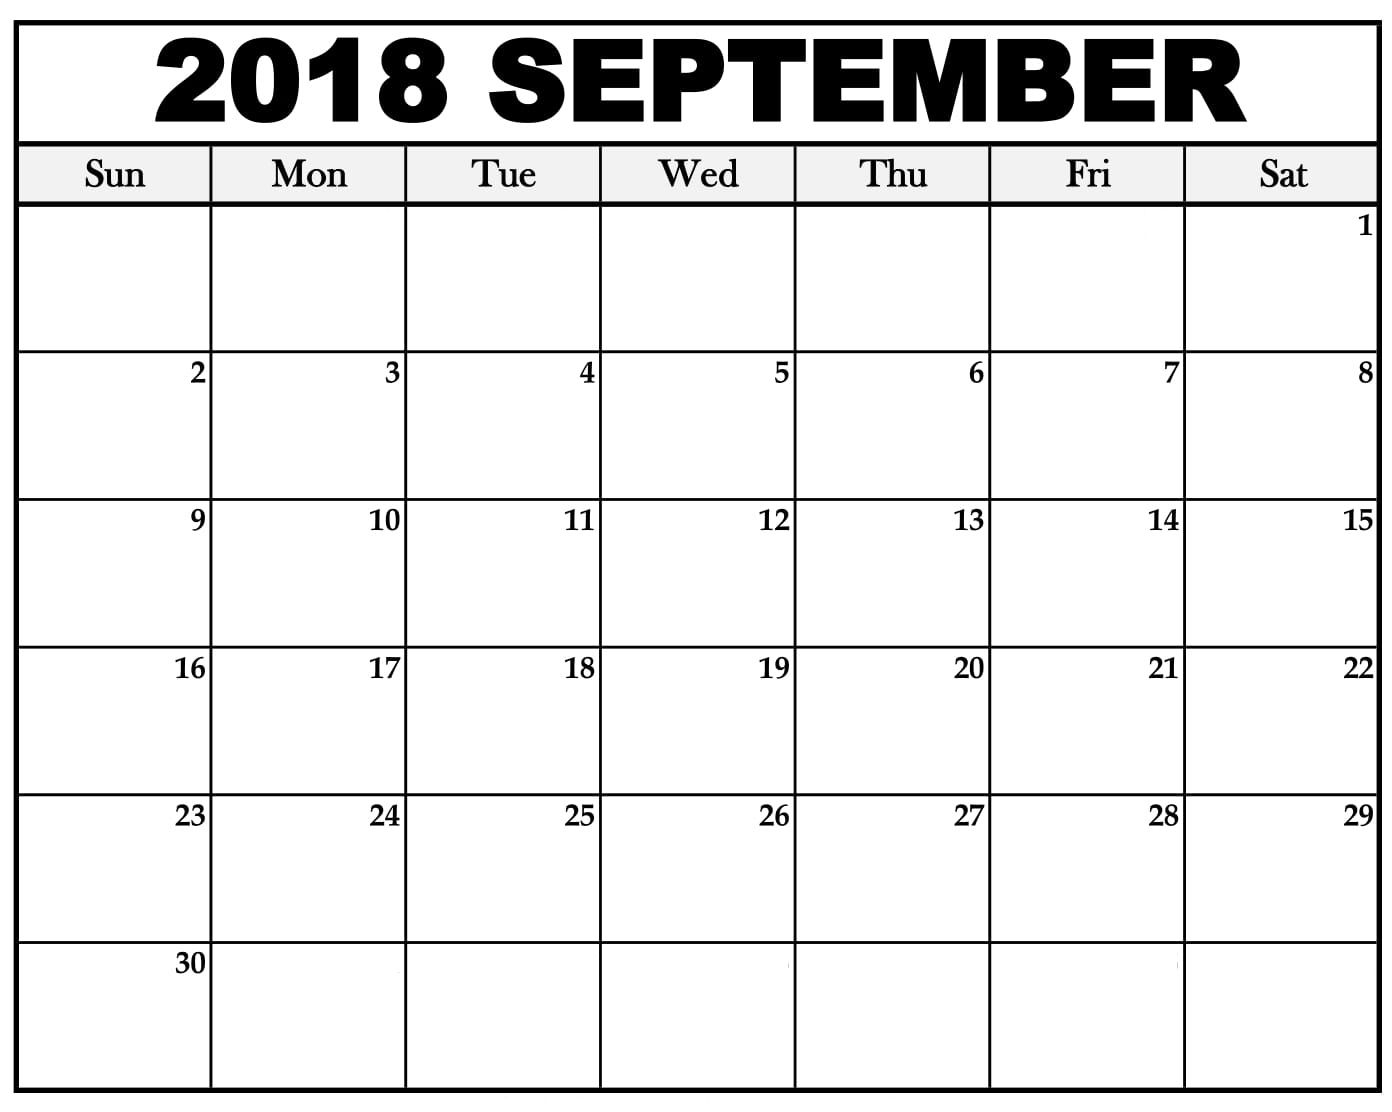 September 2018 Calendar Printable Template | September 2018 Calendar for September Calendar Printable Template